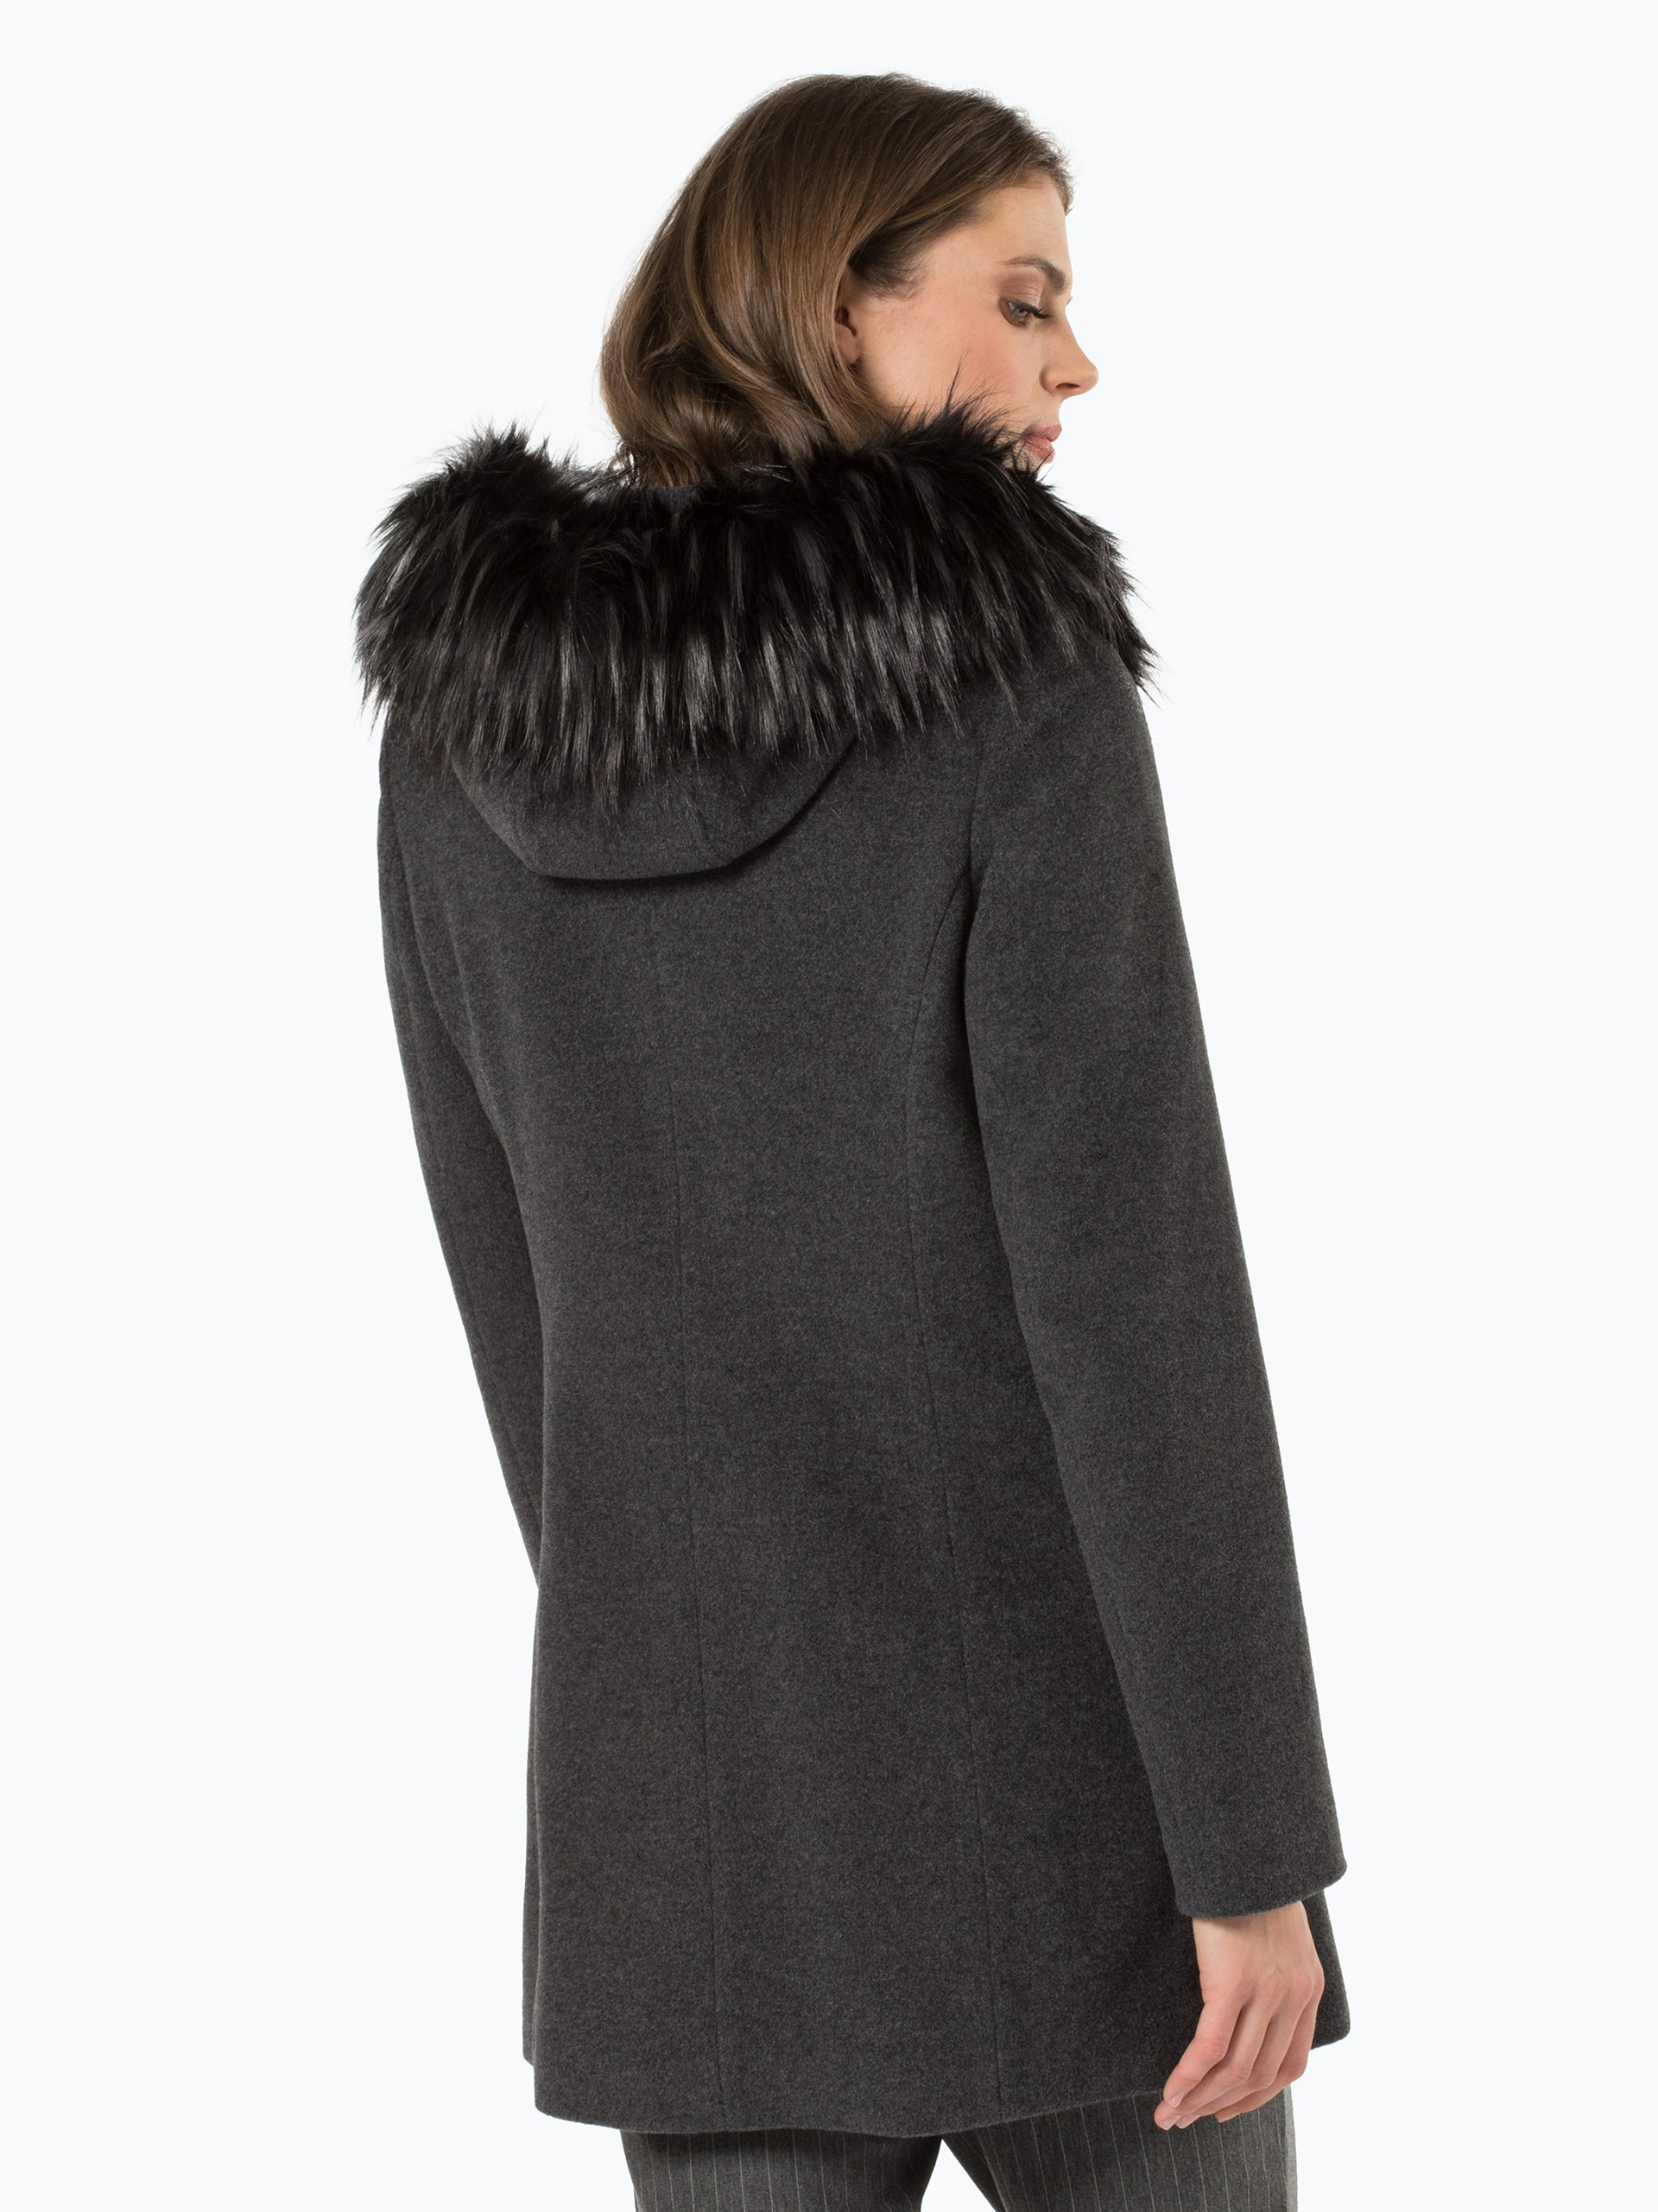 apriori damen mantel mit cashmere anteil grau uni online kaufen peek und cloppenburg de. Black Bedroom Furniture Sets. Home Design Ideas